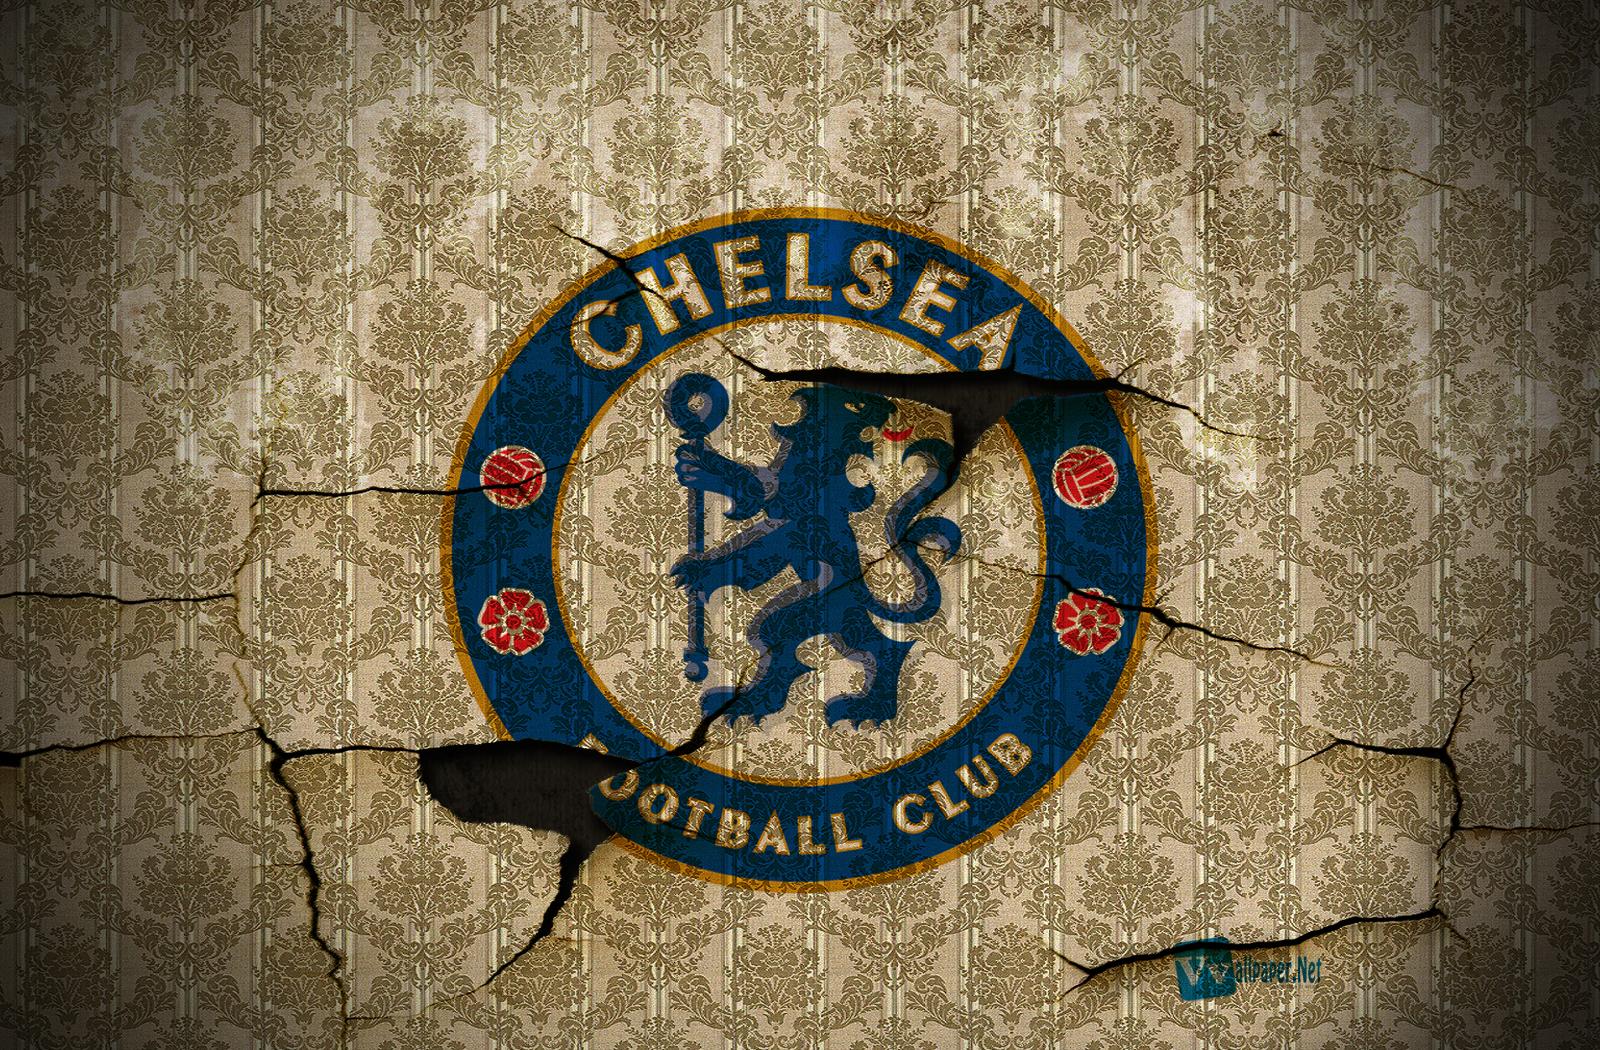 Chelsea fc soccer fresh hd wallpaper 2013 all football - Wallpaper chelsea fc hd ...